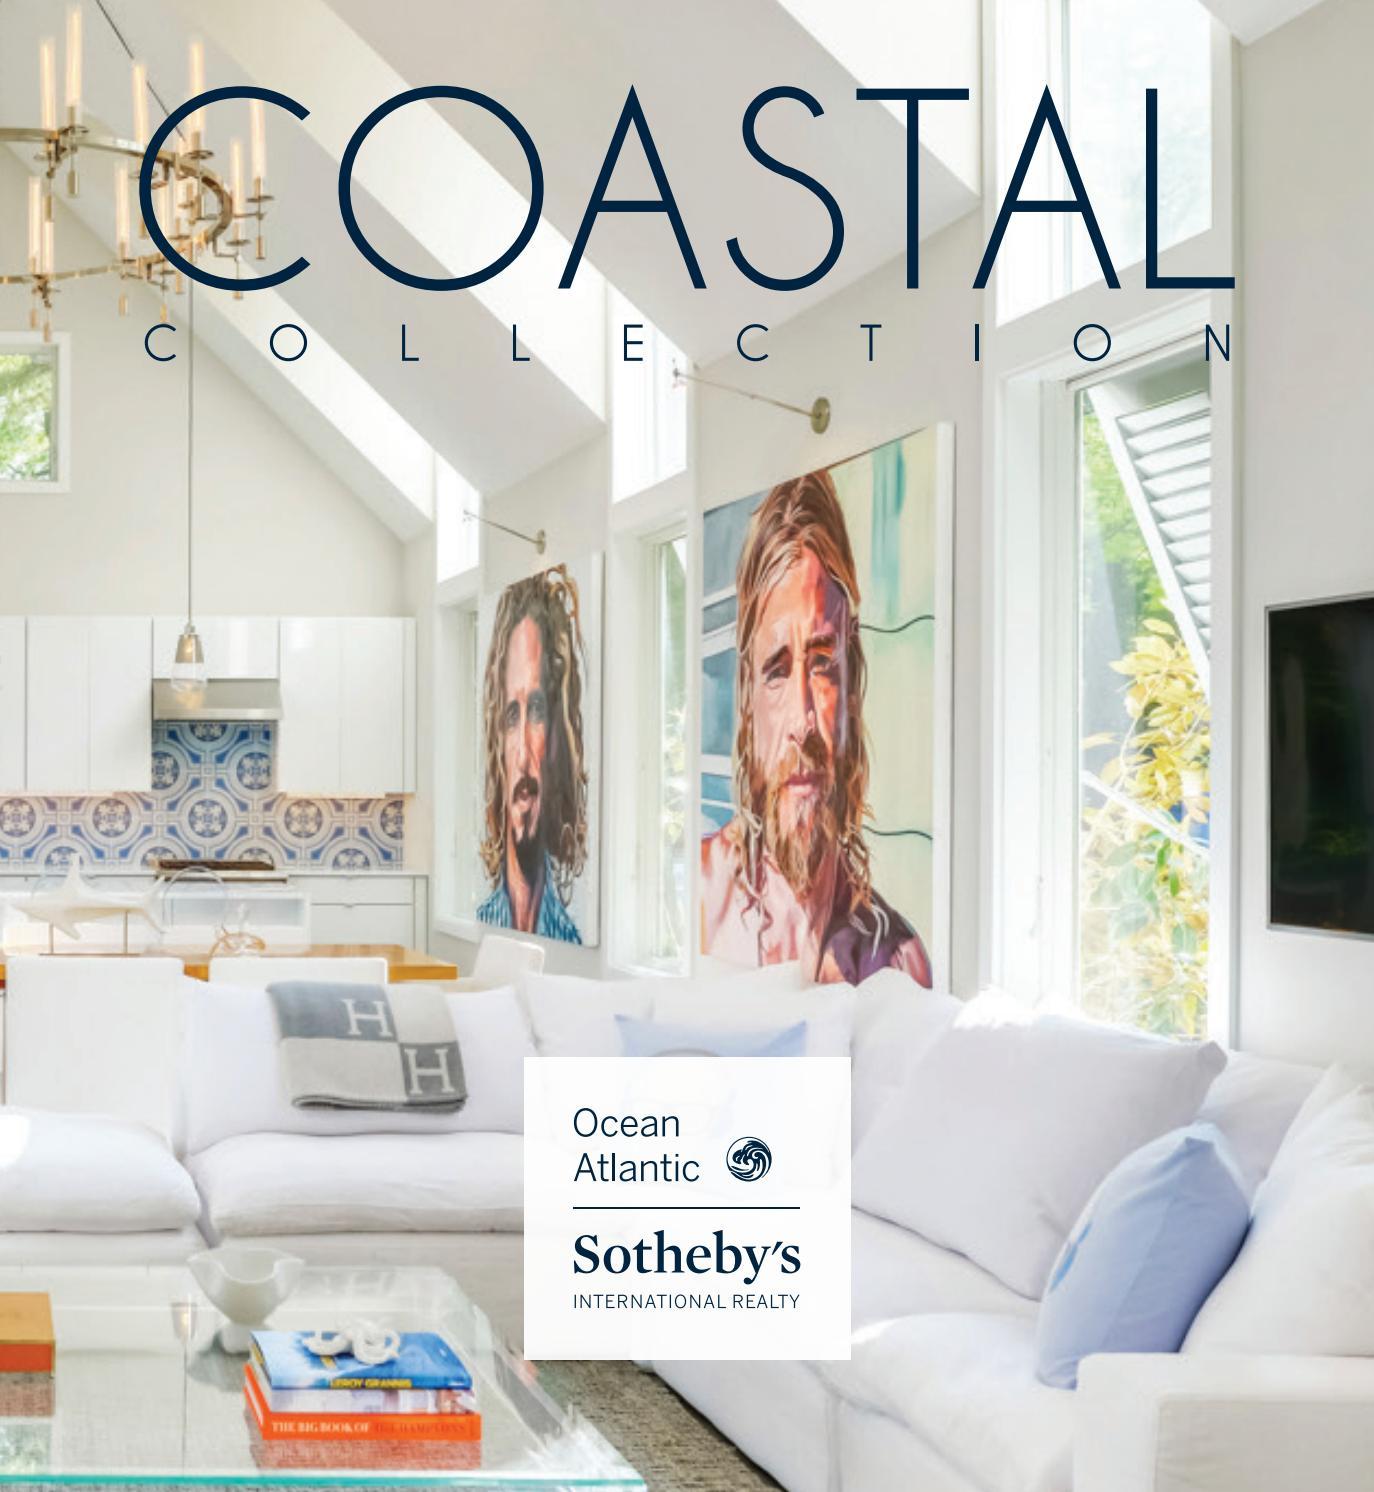 Fall '18 Coastal Collection